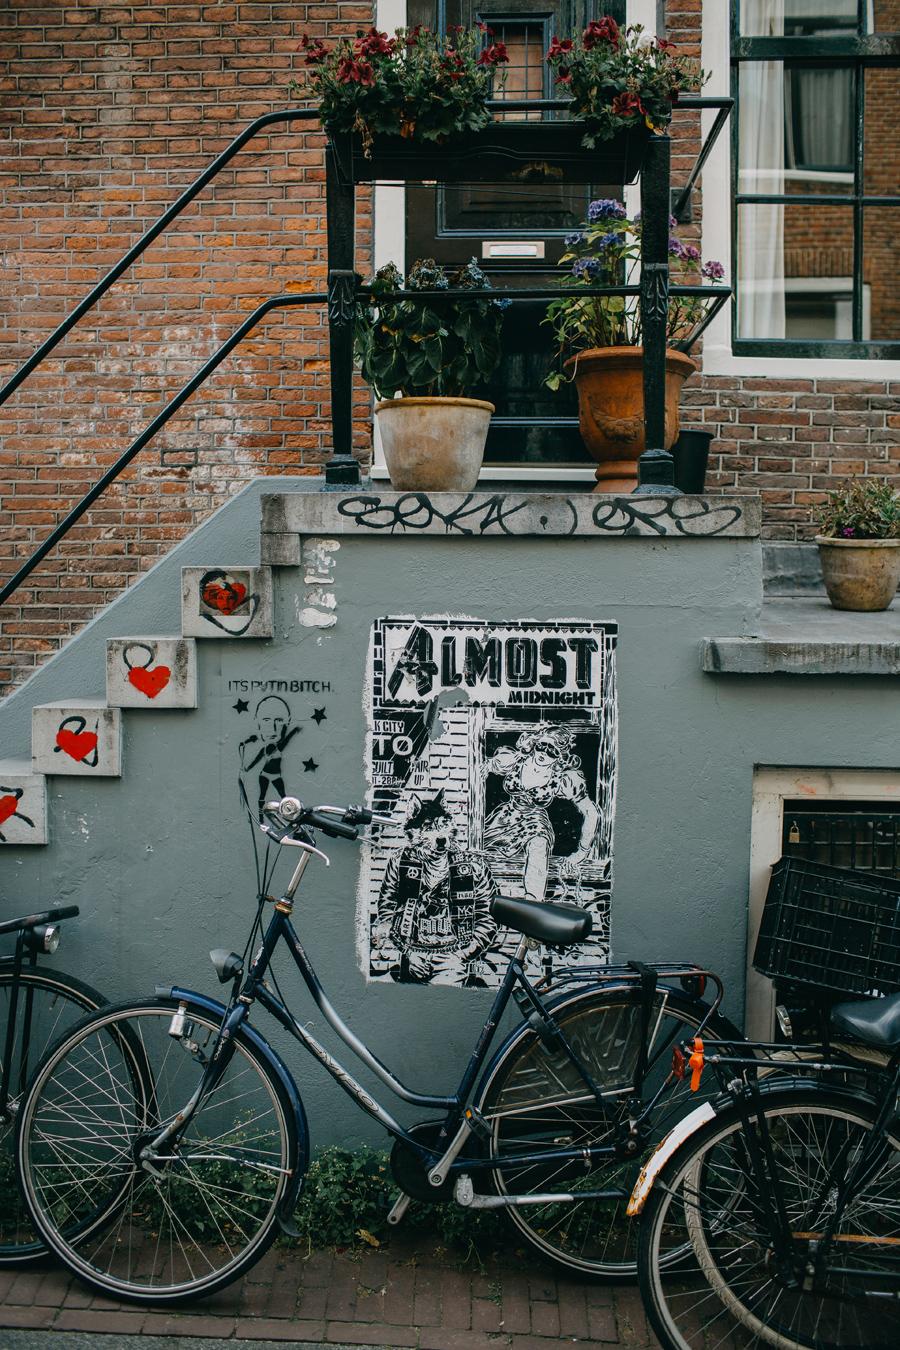 022-amsterdam-bikes-travel-photography.jpg